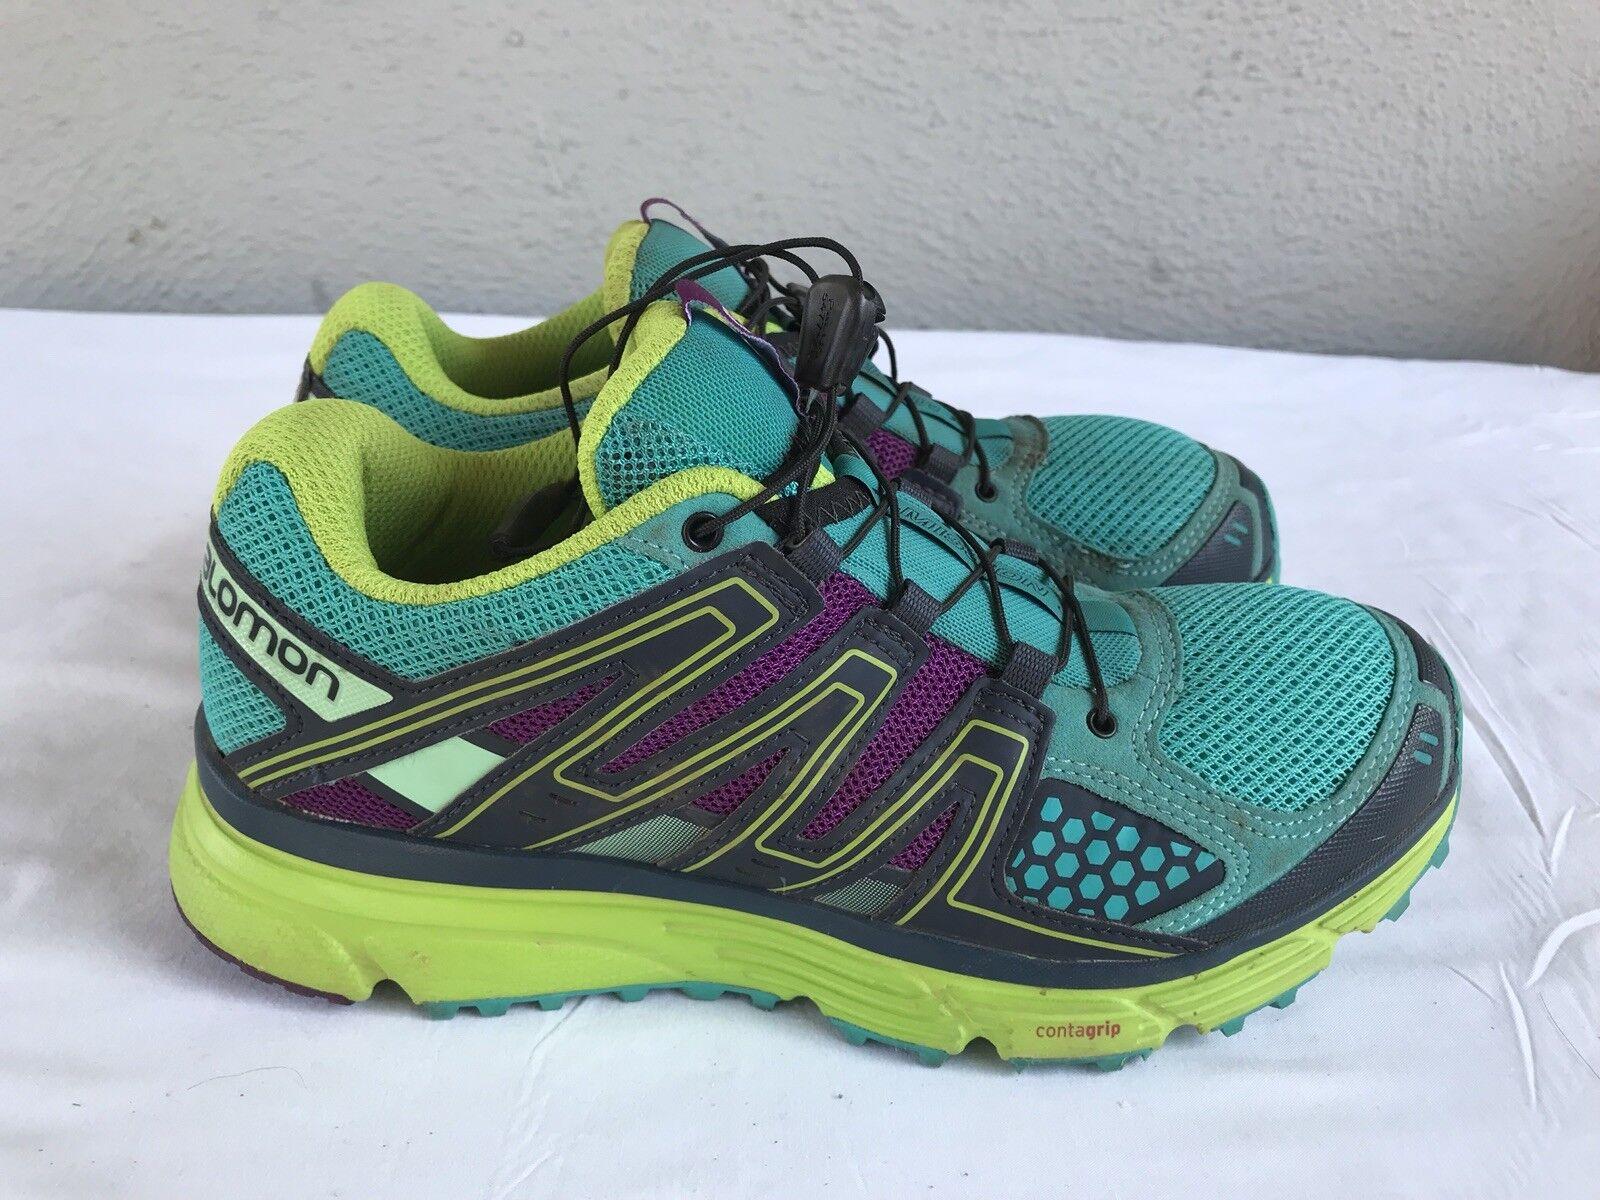 EUC  Salomon Women's Size US 7 X-Mission 3 Contra-Grip Trail Running shoes B